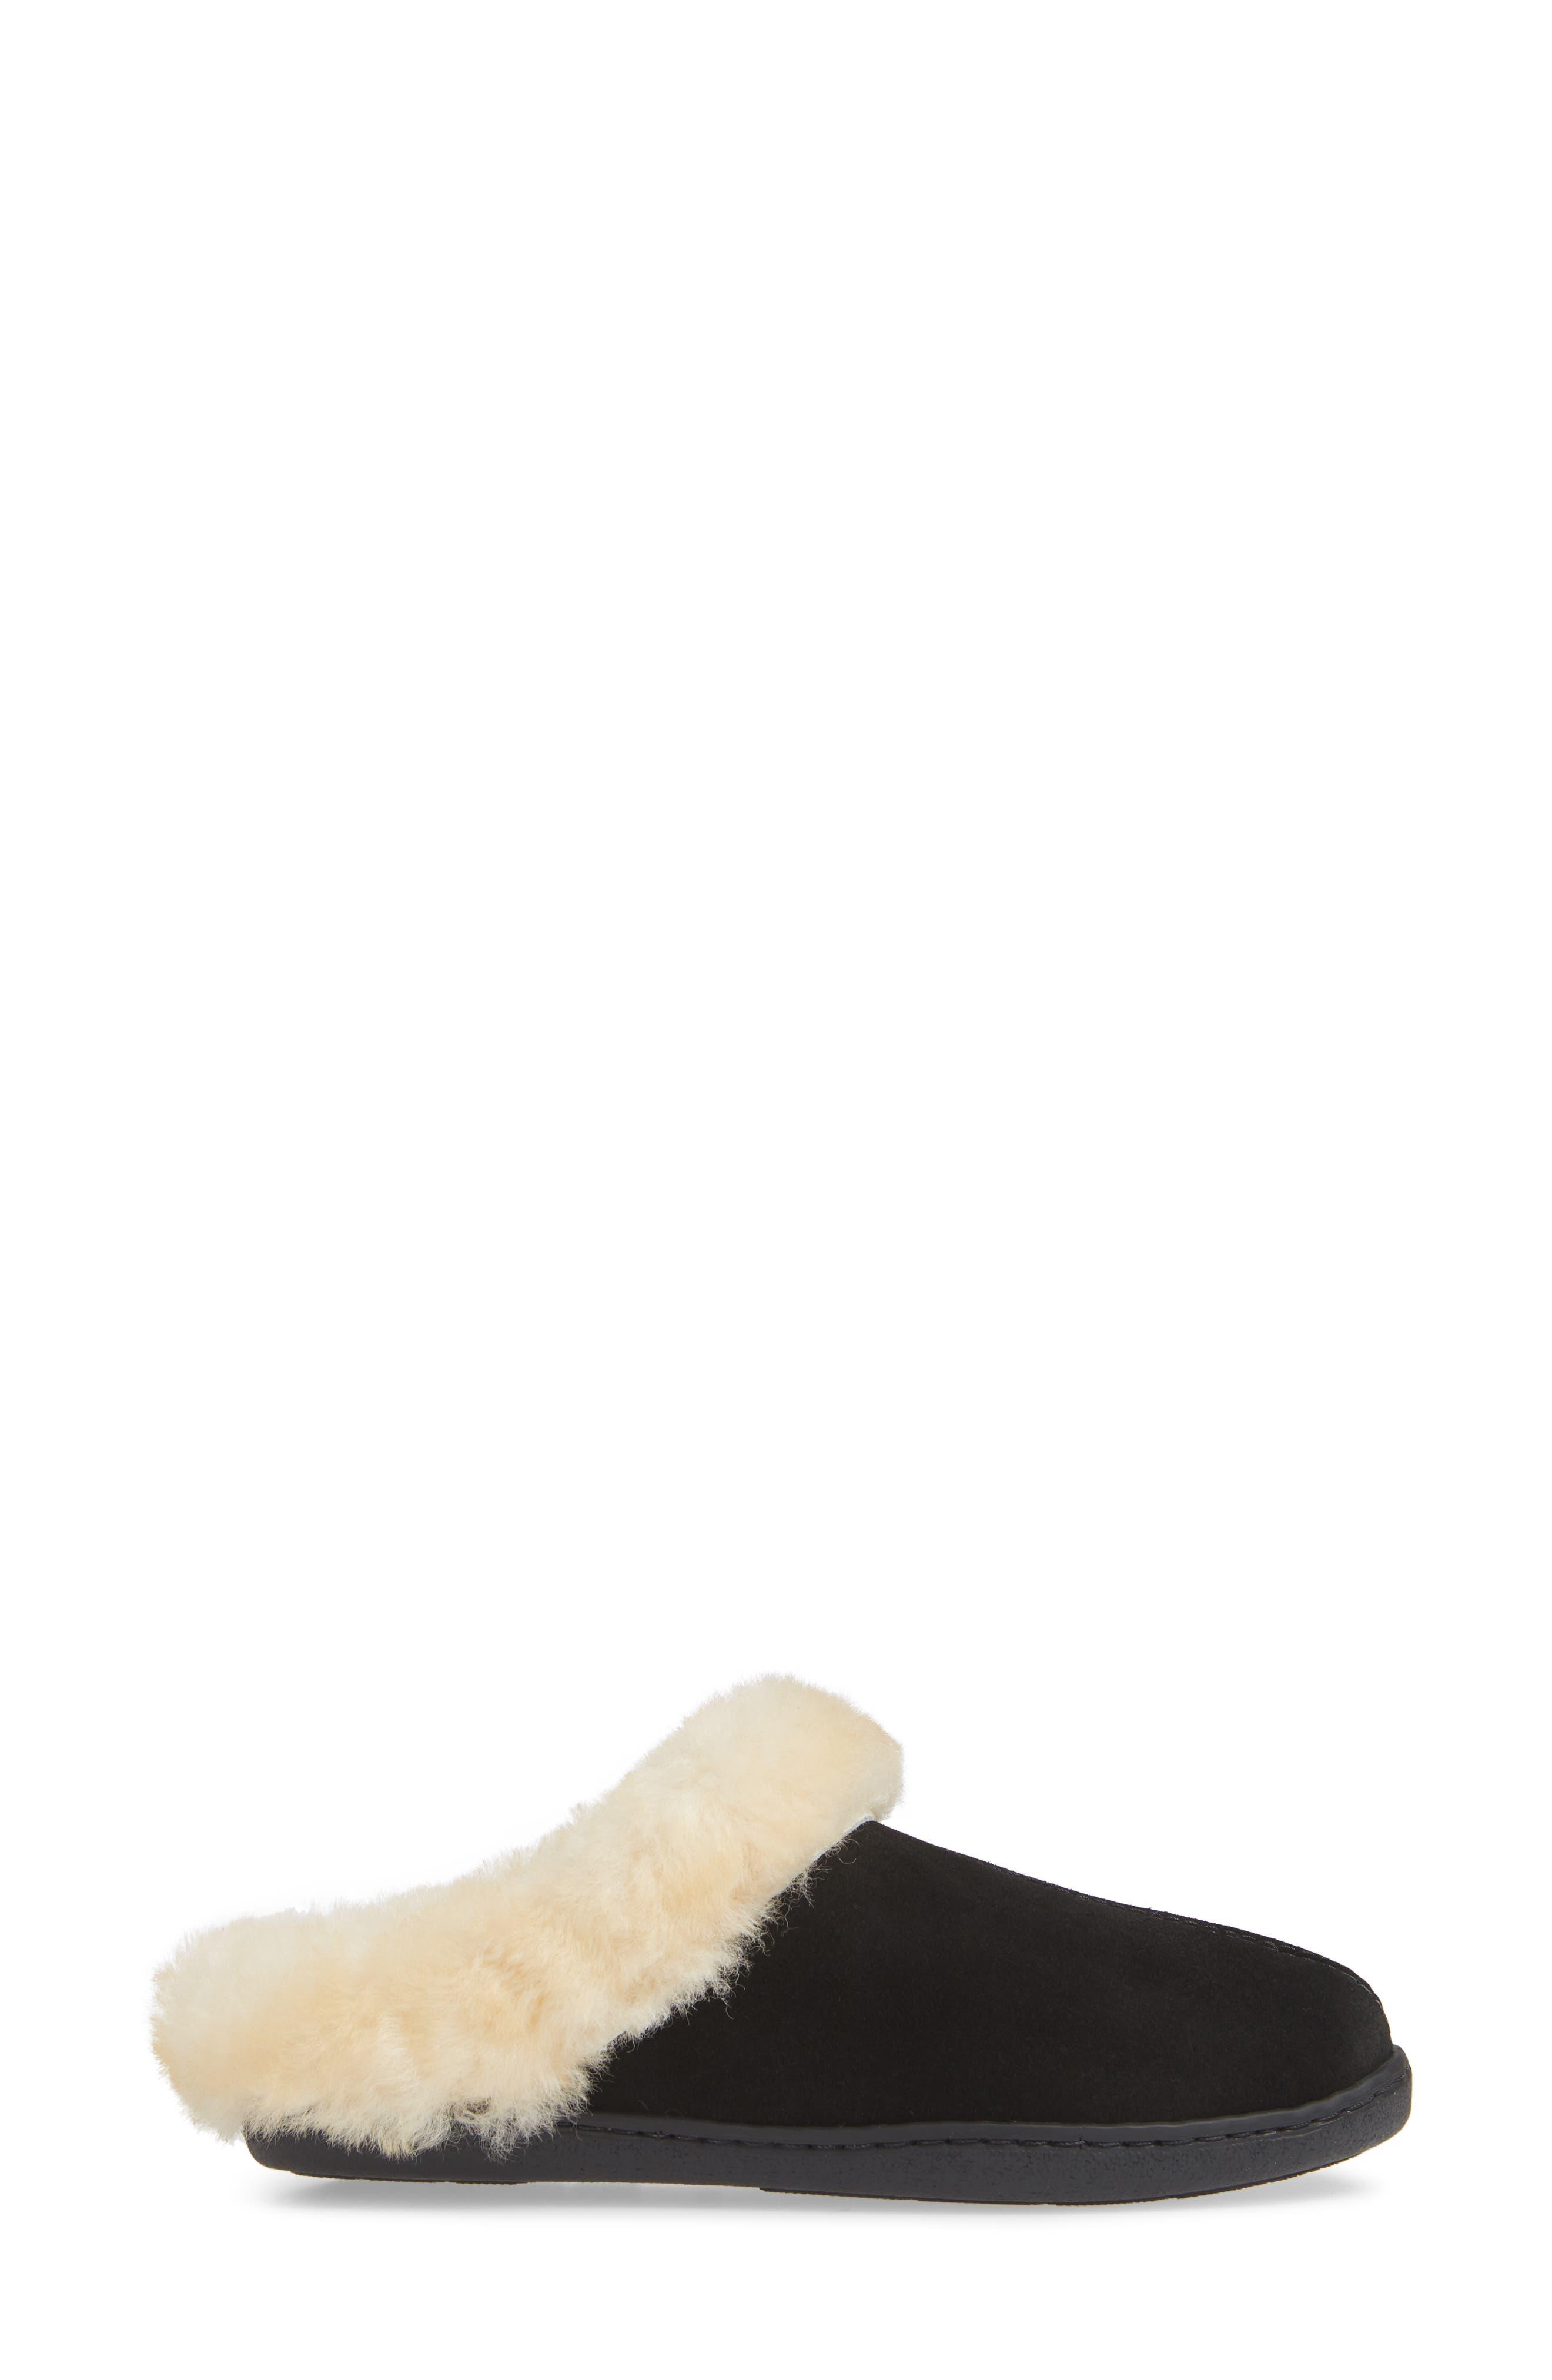 SheepskinMule Slipper,                             Alternate thumbnail 3, color,                             BLACK SUEDE